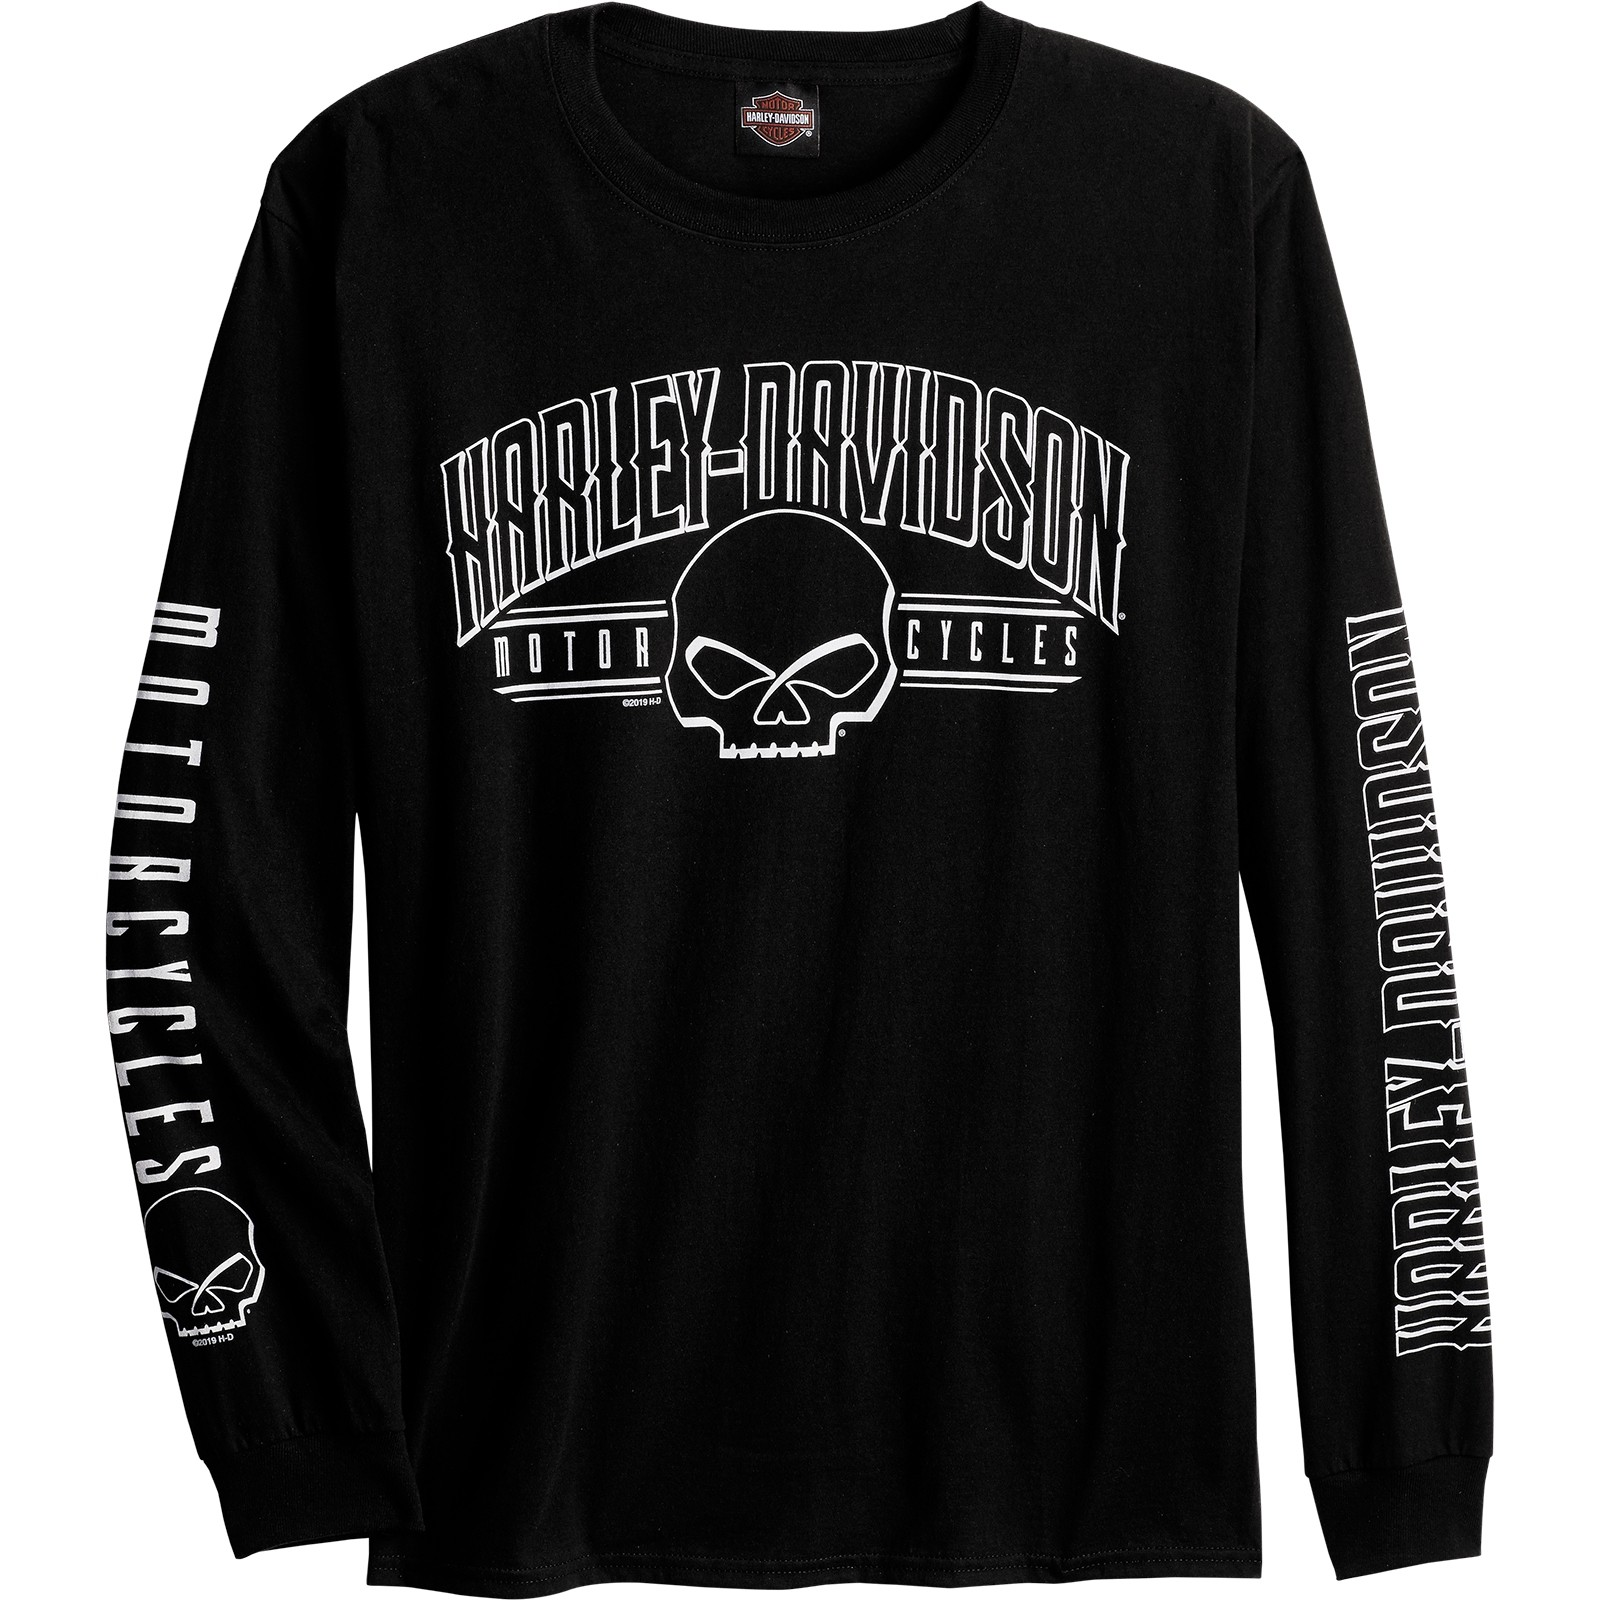 Harley-Davidson Men's Long-Sleeve Graphic Tee - USAG Yongsan | Arch G